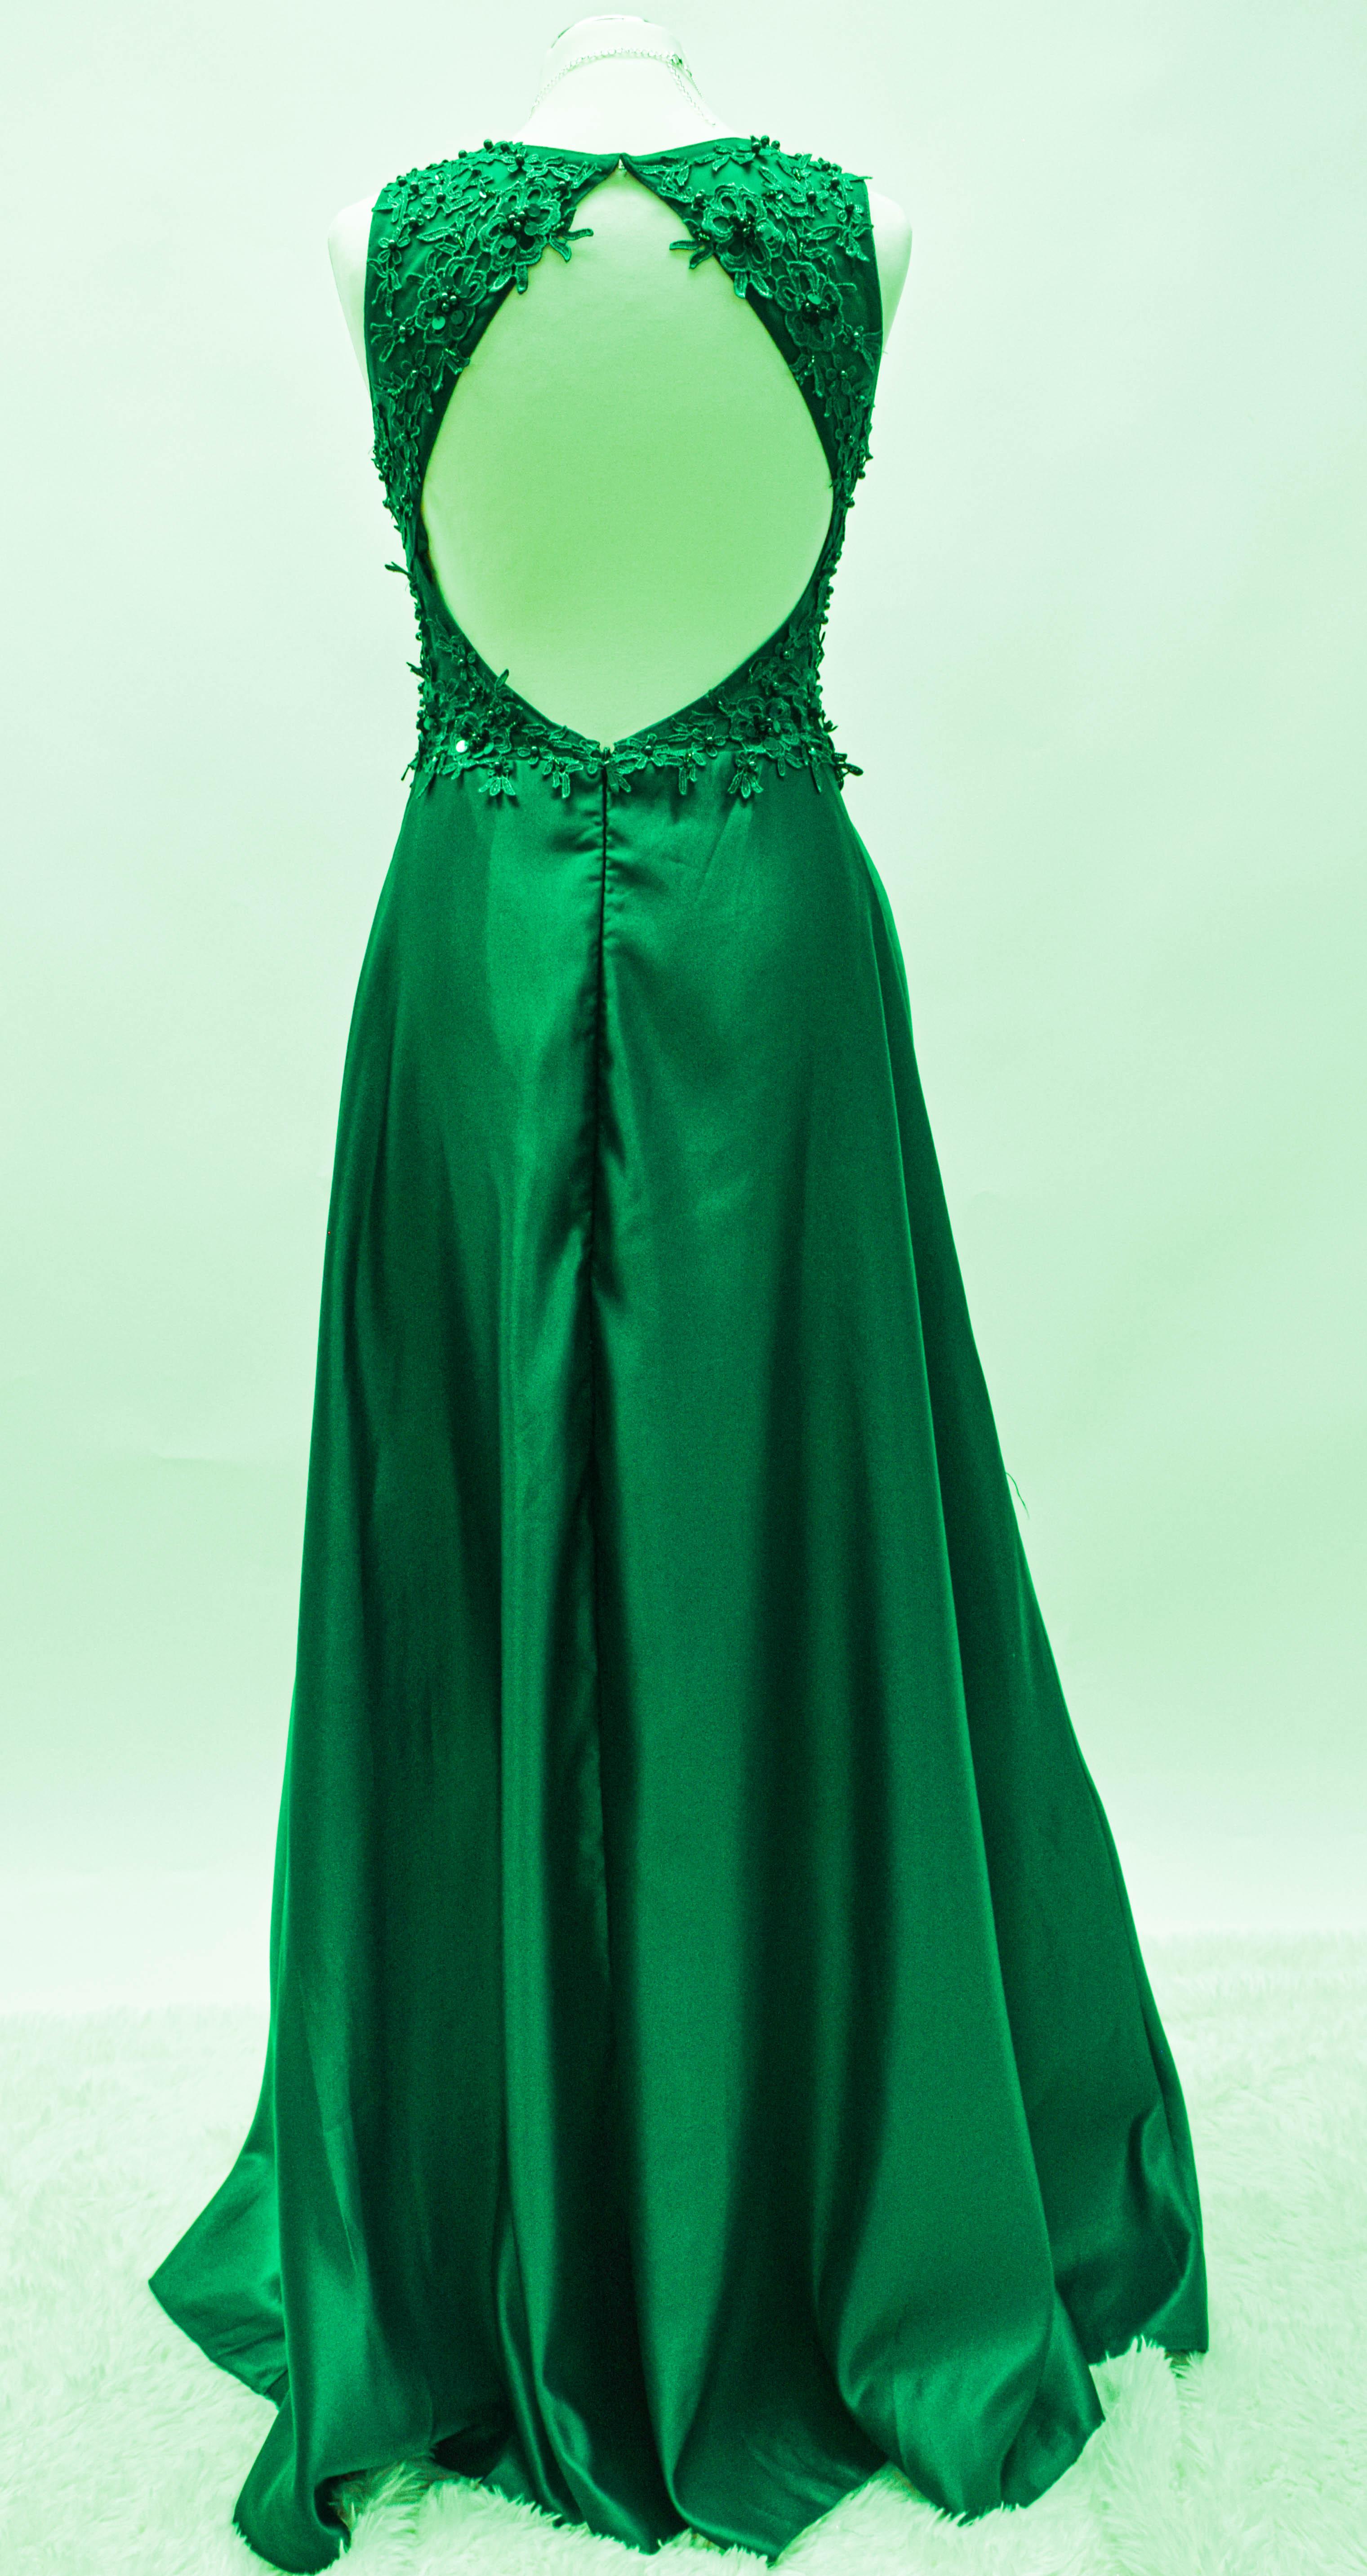 Abendkleid in Smaragdgrün, Altrosa, Taubenblau